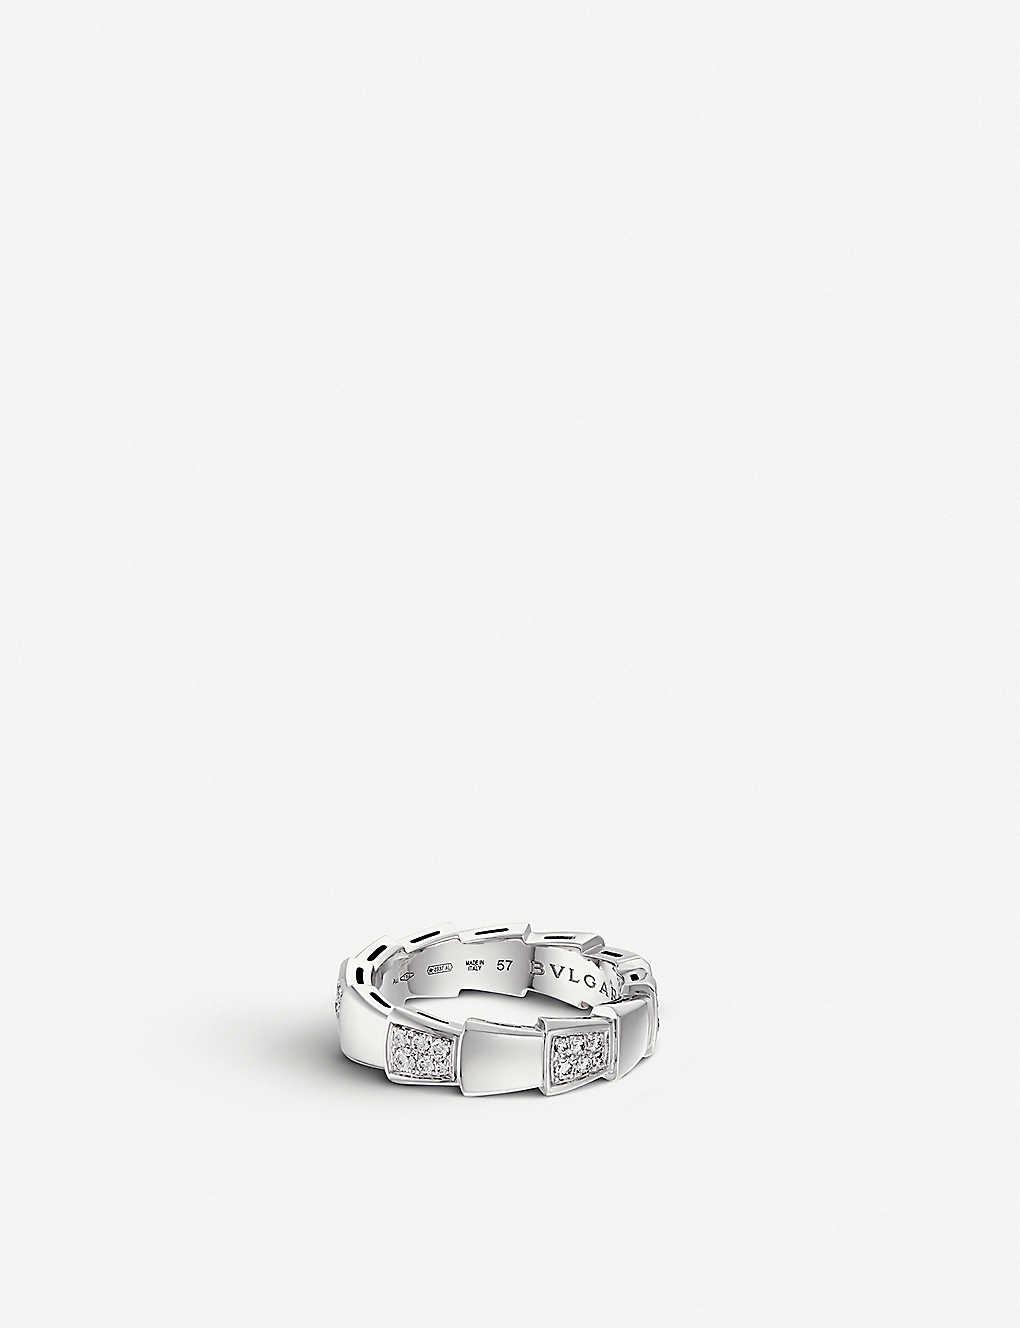 668161d9a485f BVLGARI - Serpenti 18ct white-gold and diamond ring | Selfridges.com